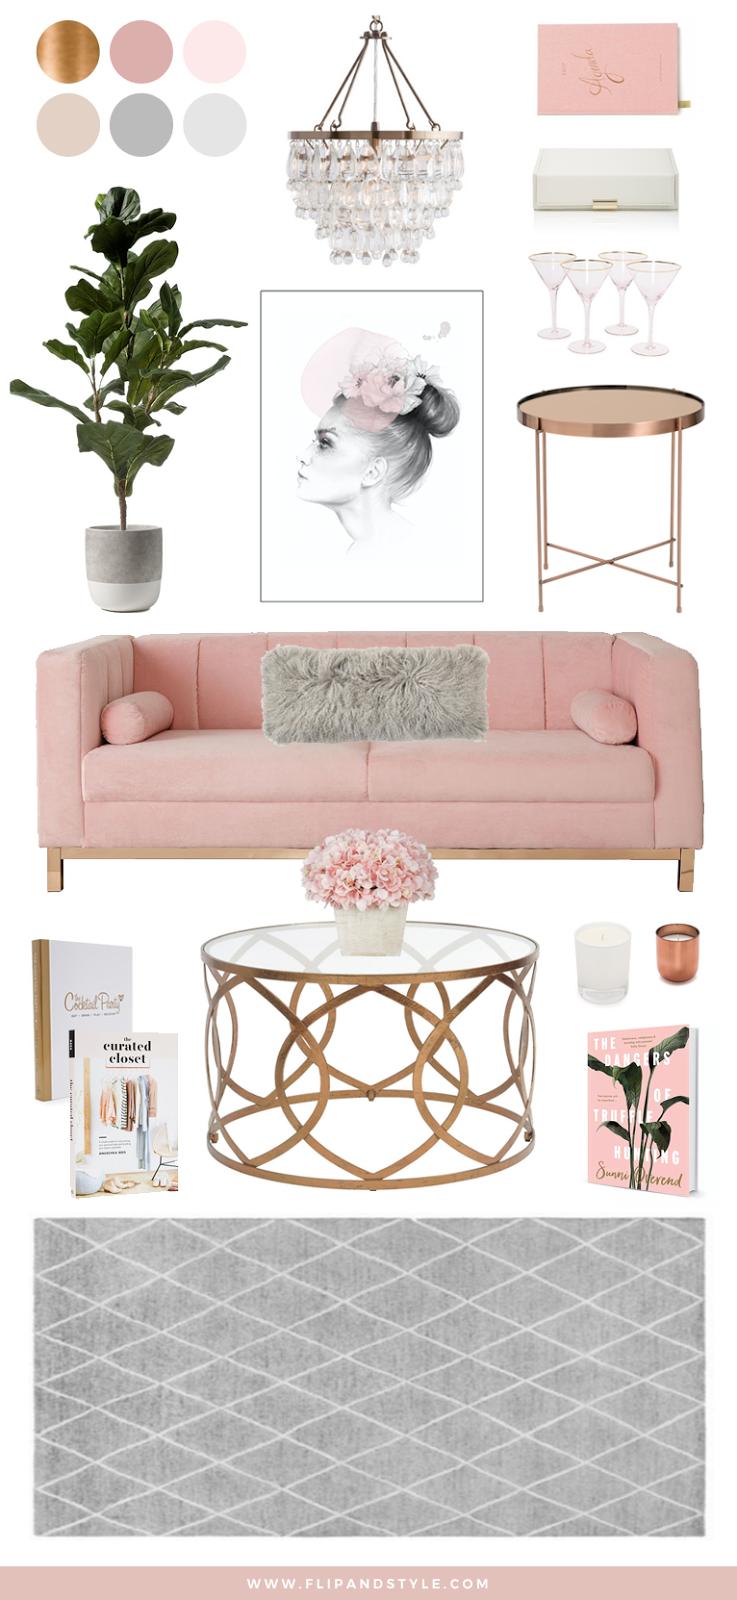 Blush, Copper + Grey Home Decor | Australian fashion, Lifestyle blog ...